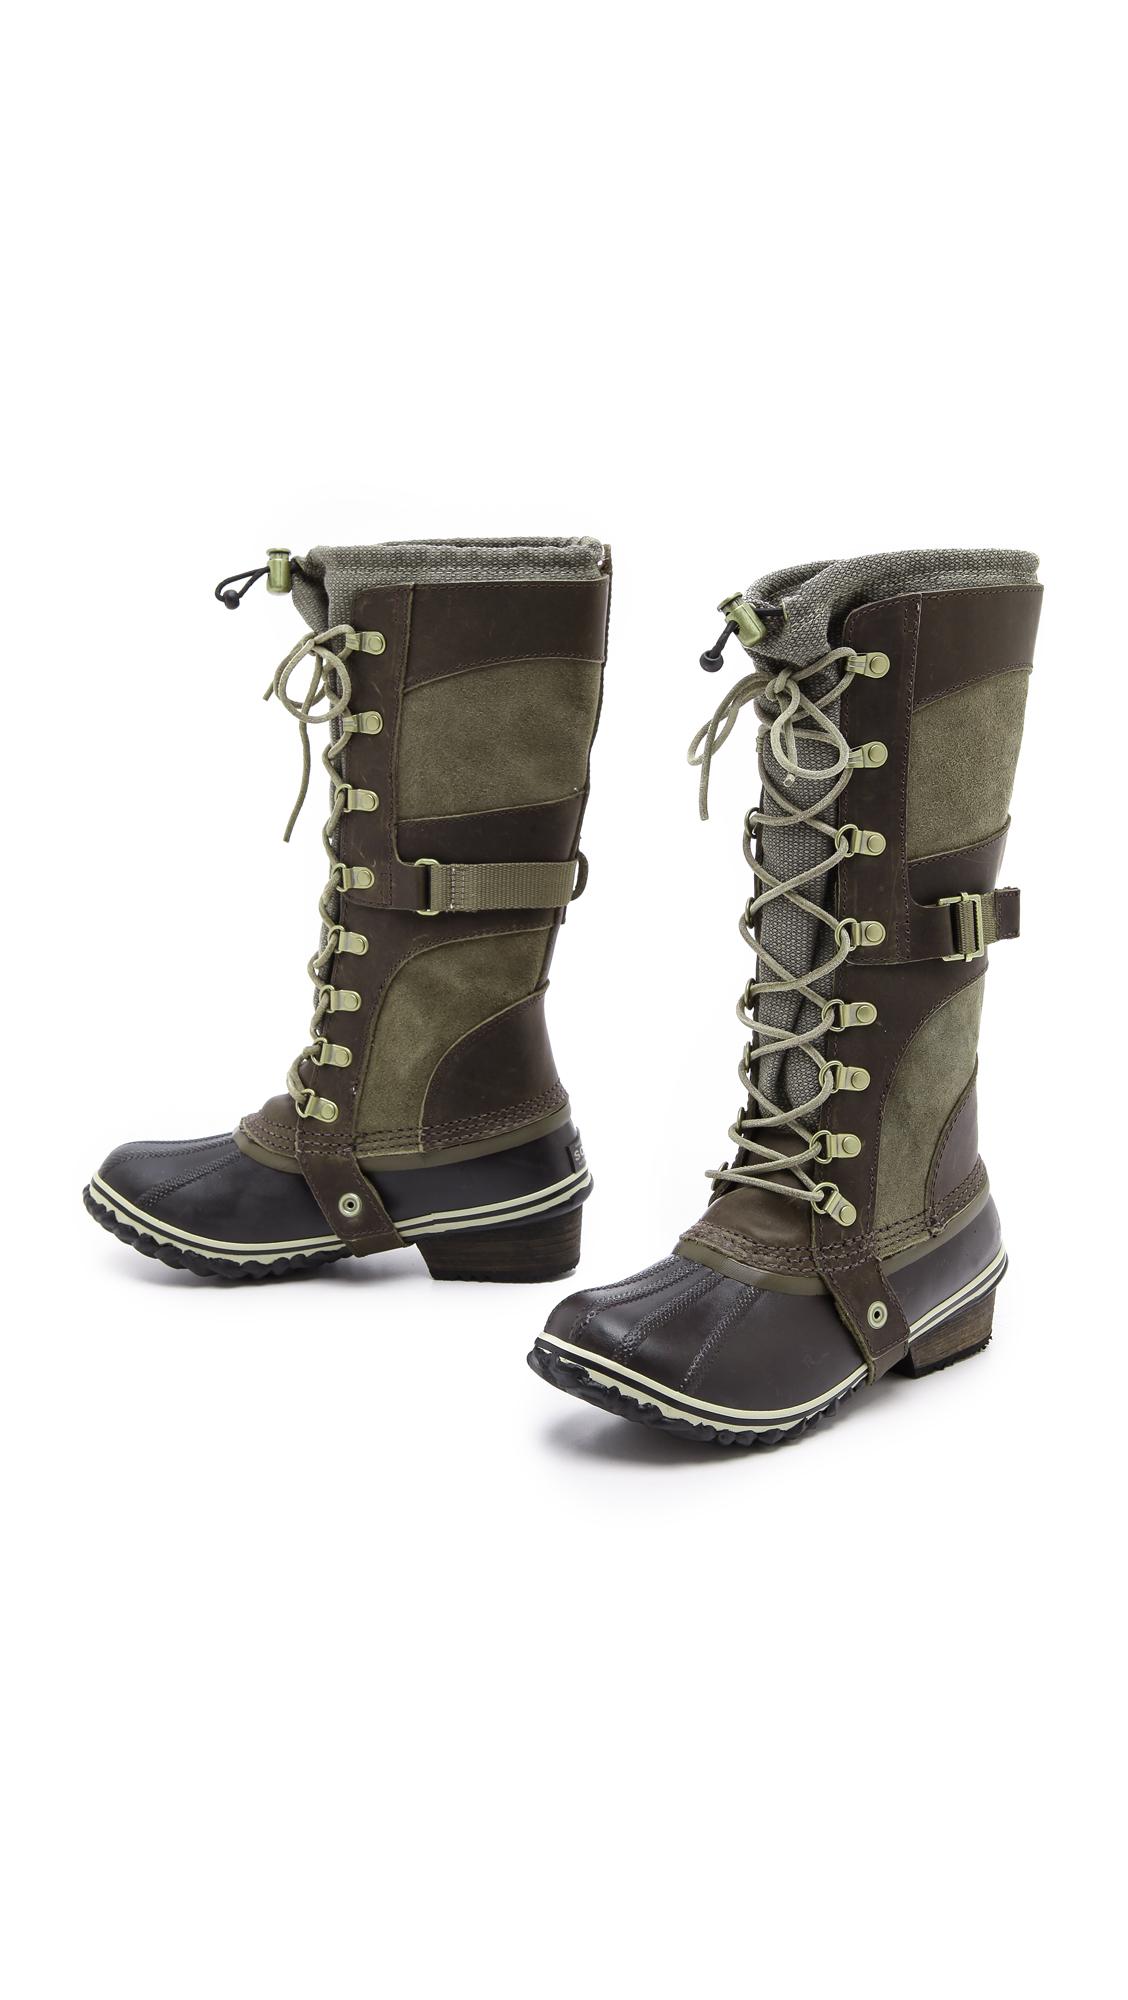 Lyst Sorel Slimpack Riding Boot In Brown